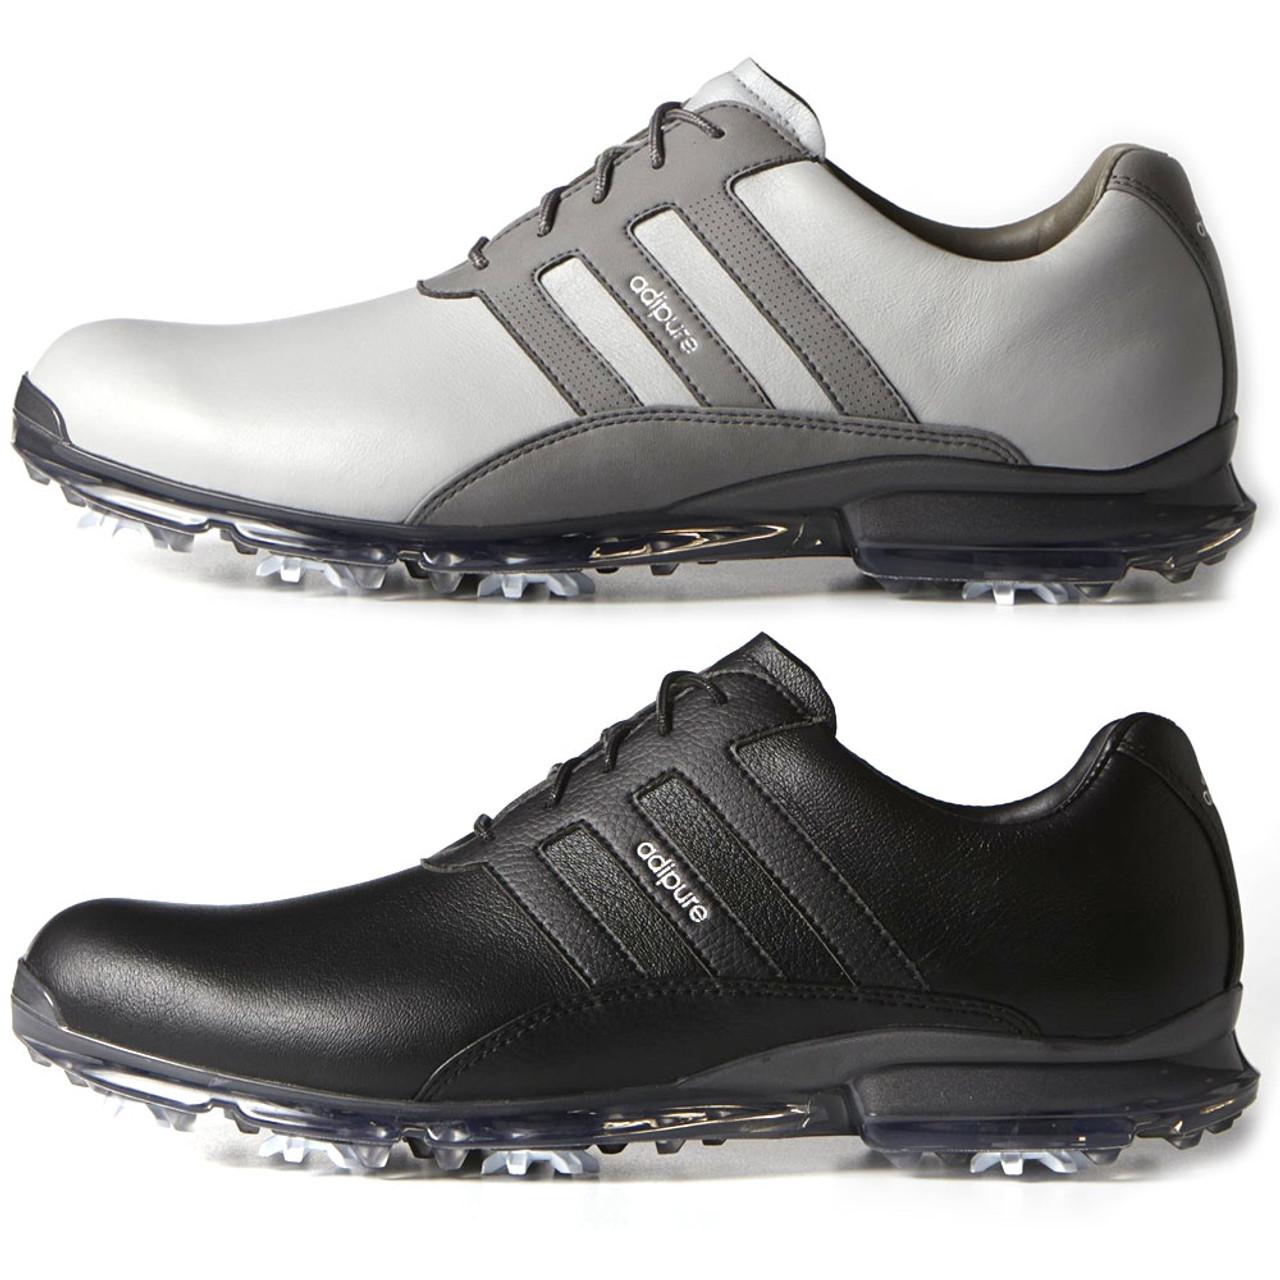 Adidas Adipure Classic Golf Shoes 2016